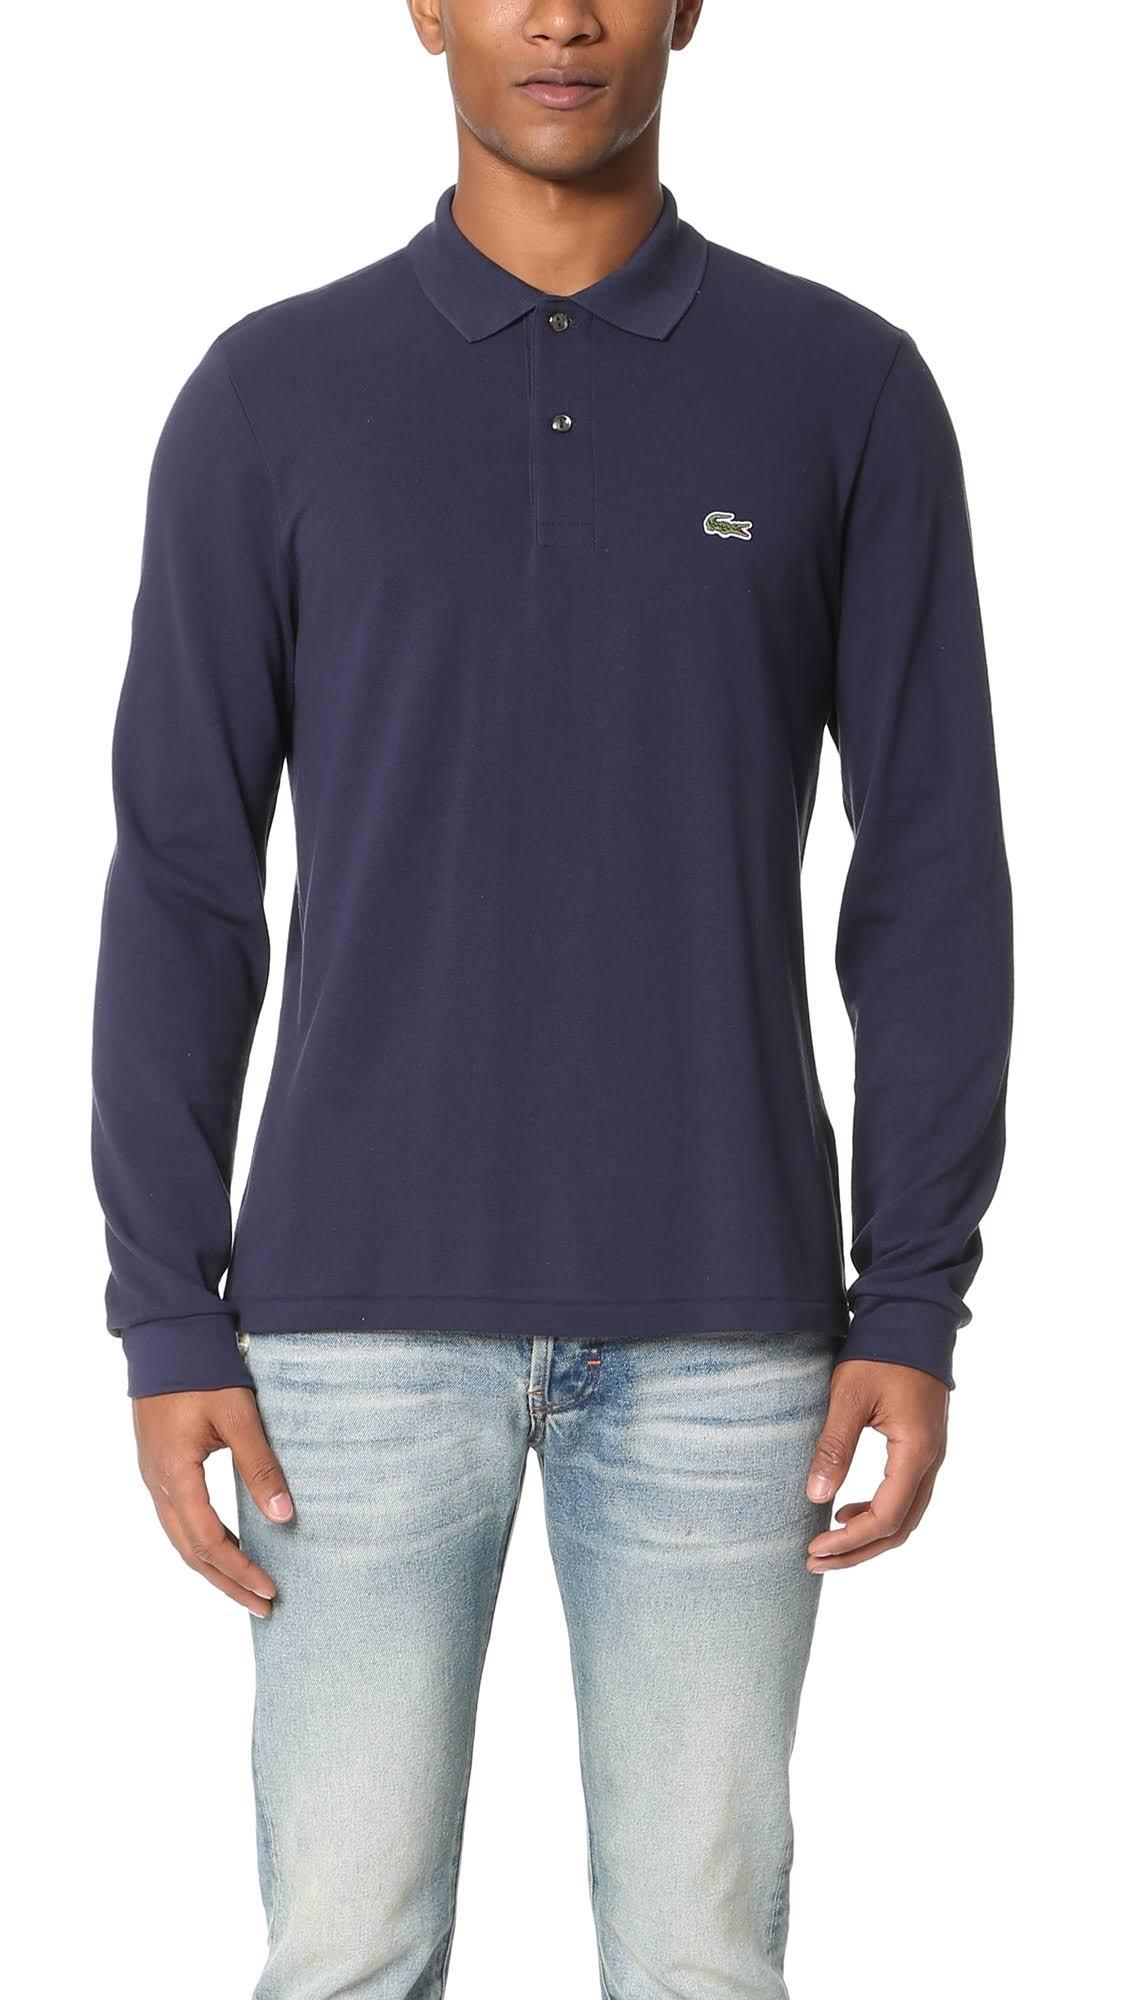 X Herren Langarm Lacoste Pique large Poloshirt Marineblau xP8B0Tw